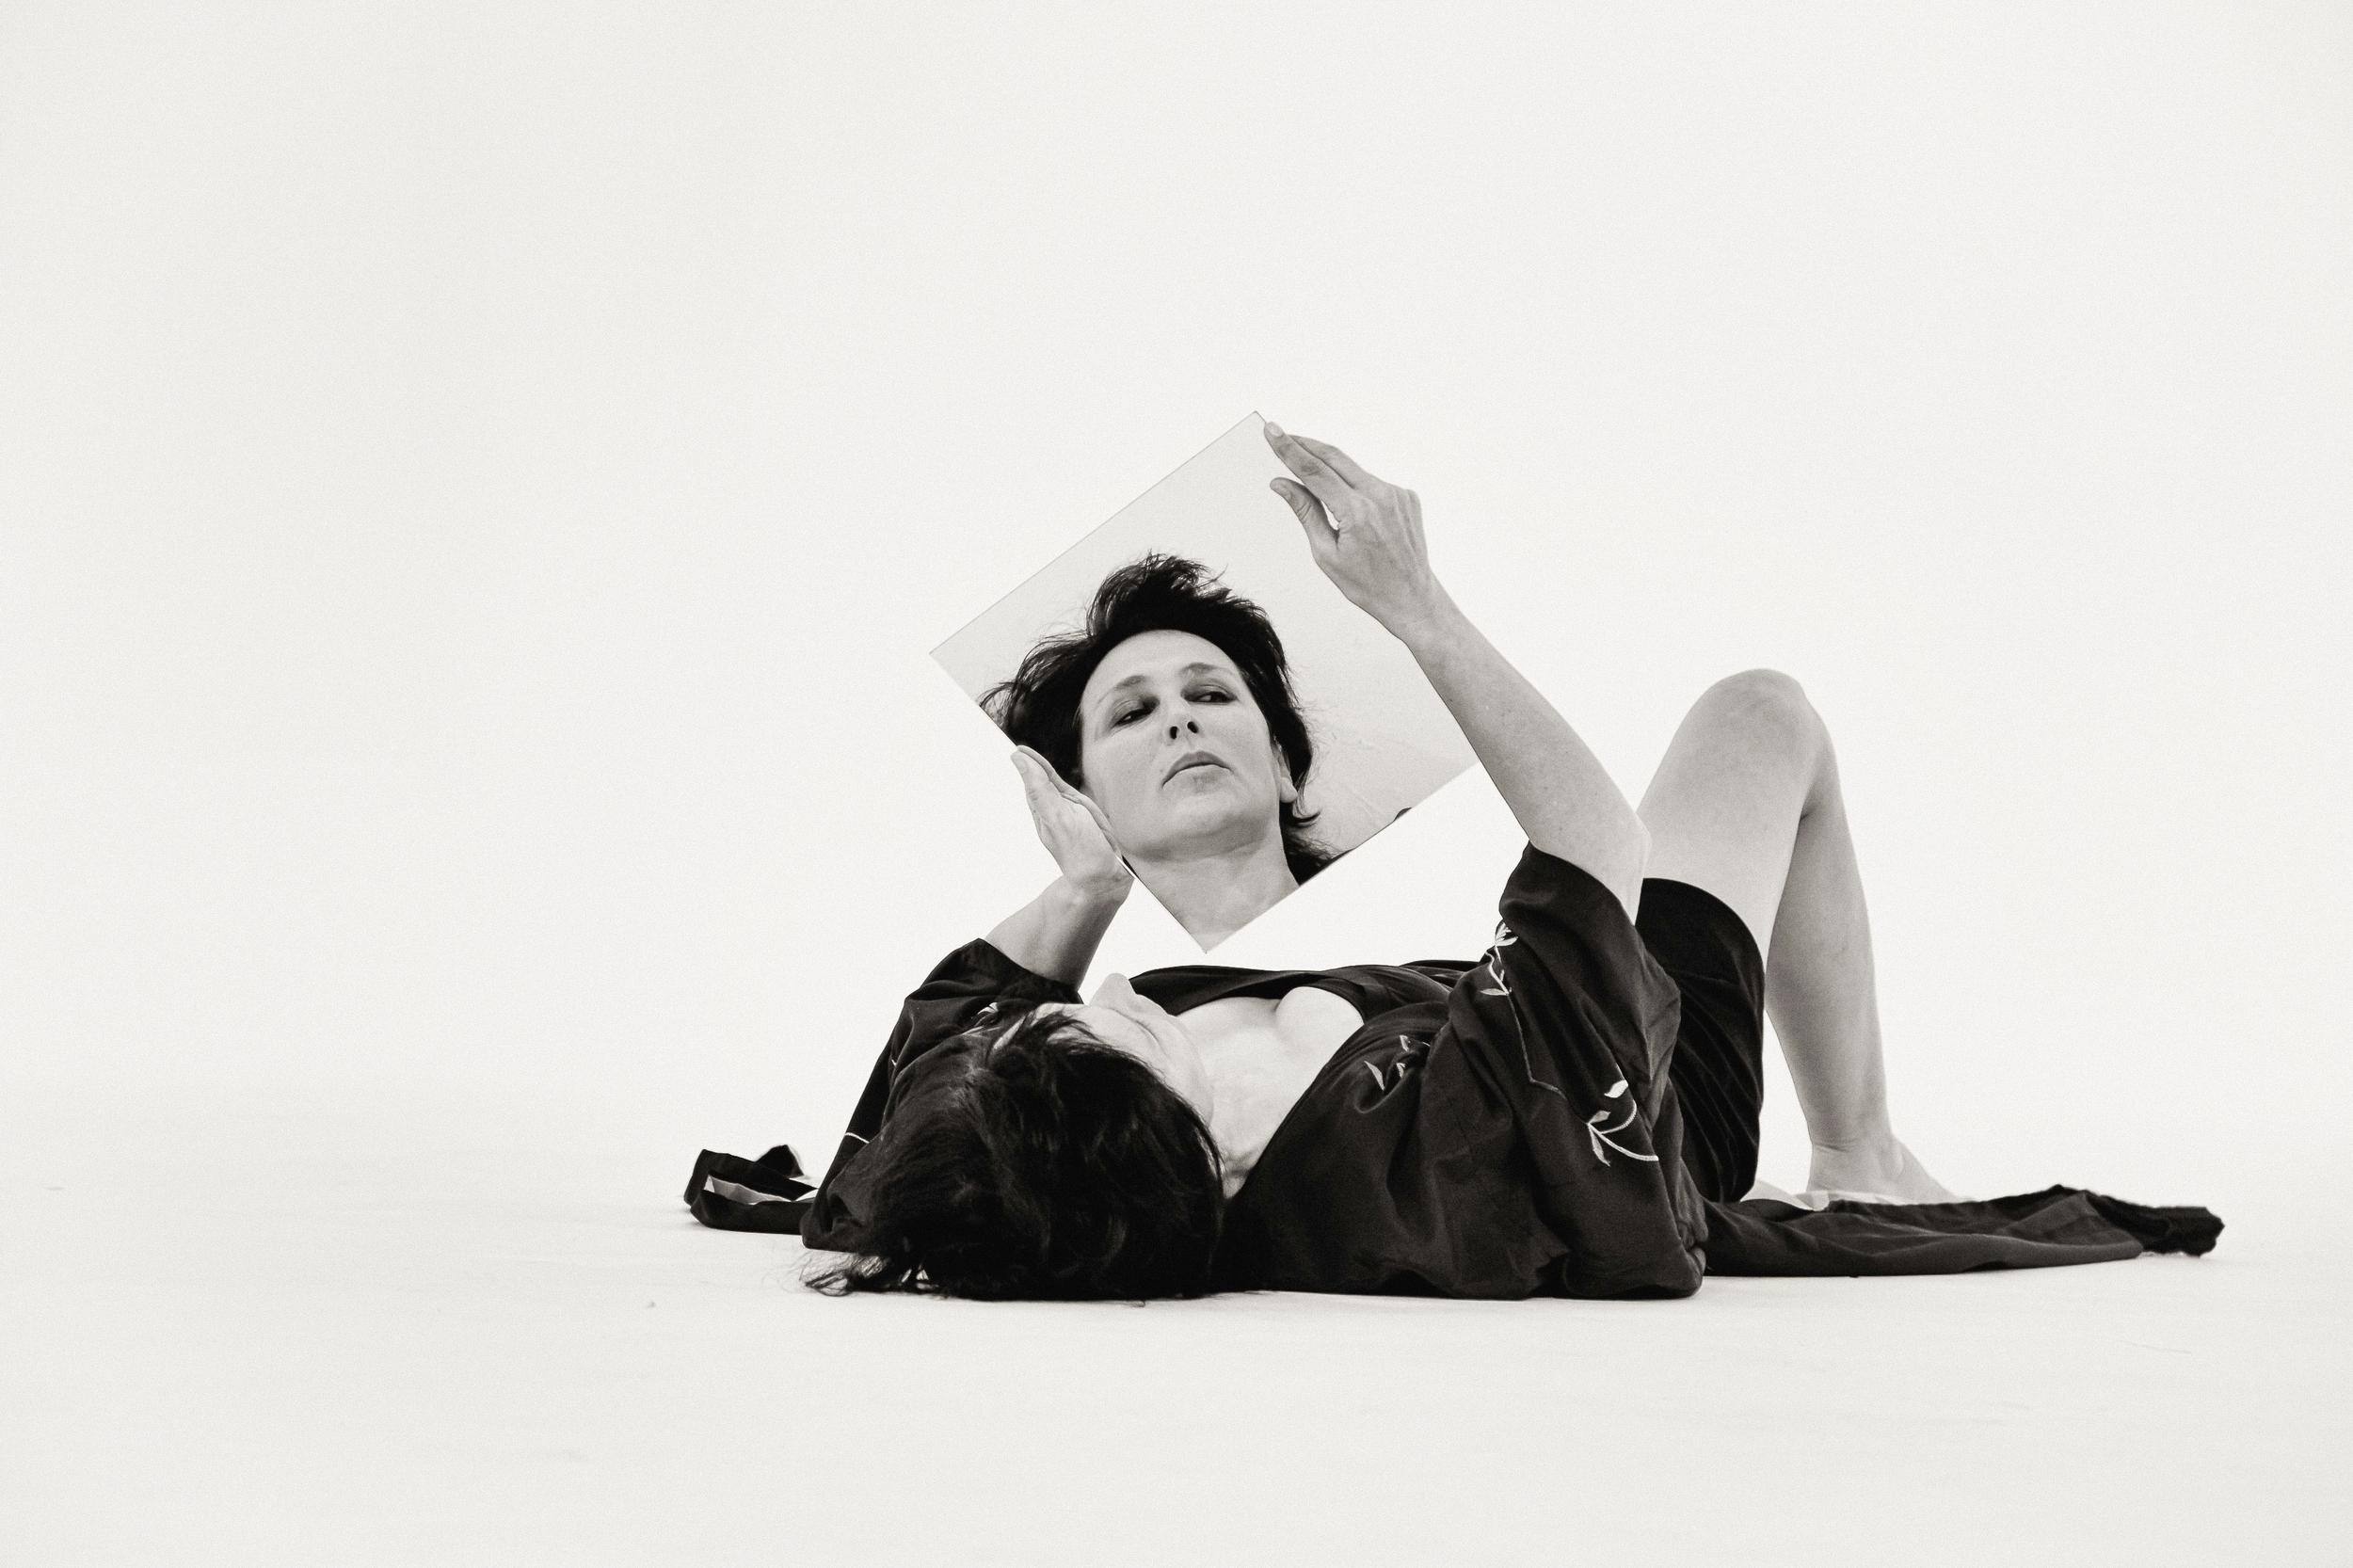 Lisa Ramirez in  Medea  by Bryan Davidson Blue. Photo by  Sion Fullana: Visual Storytelling.